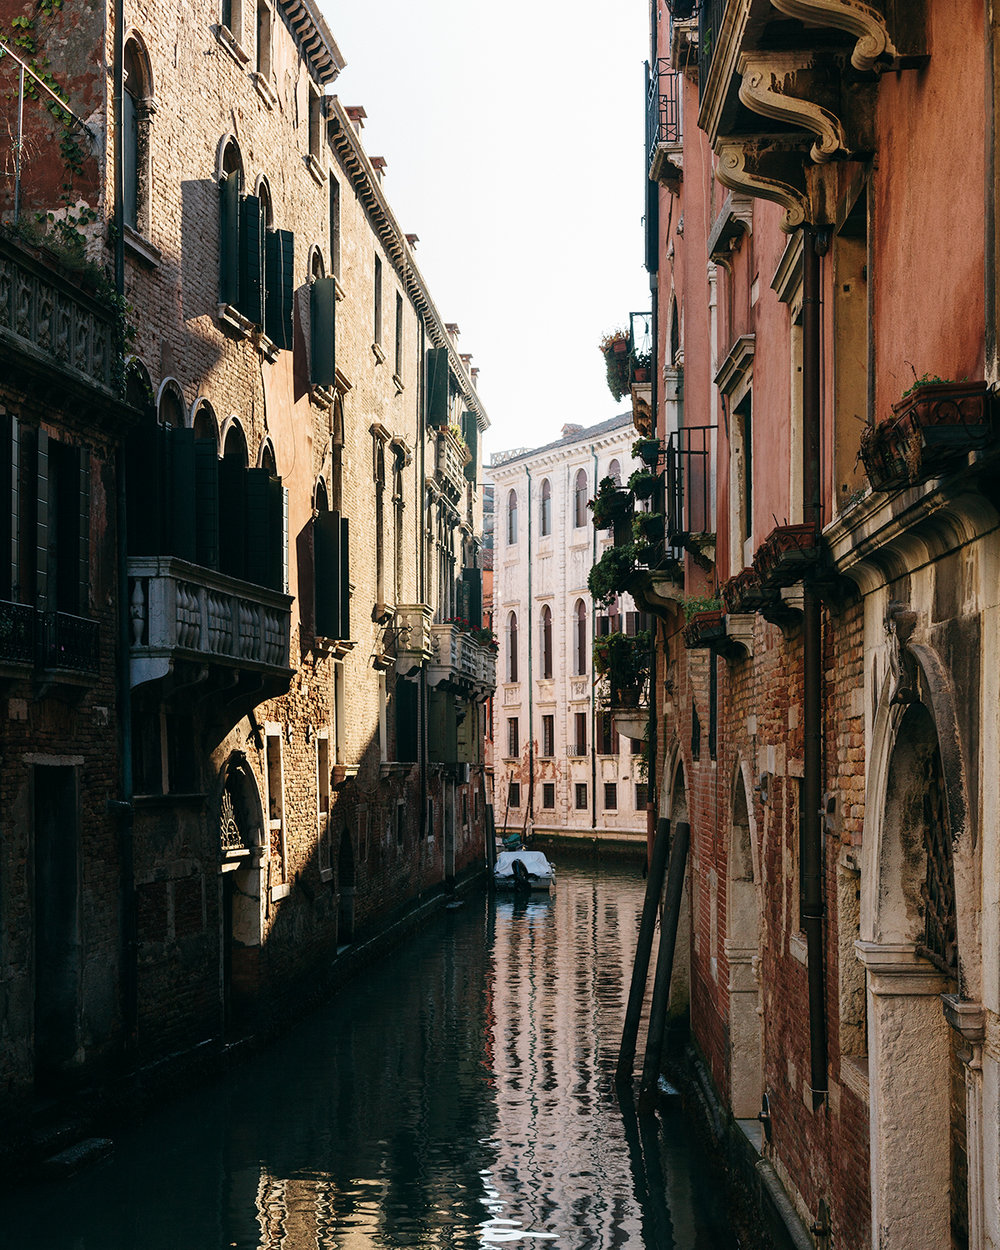 Brandon-Sampson-Photography-Italy-Venice